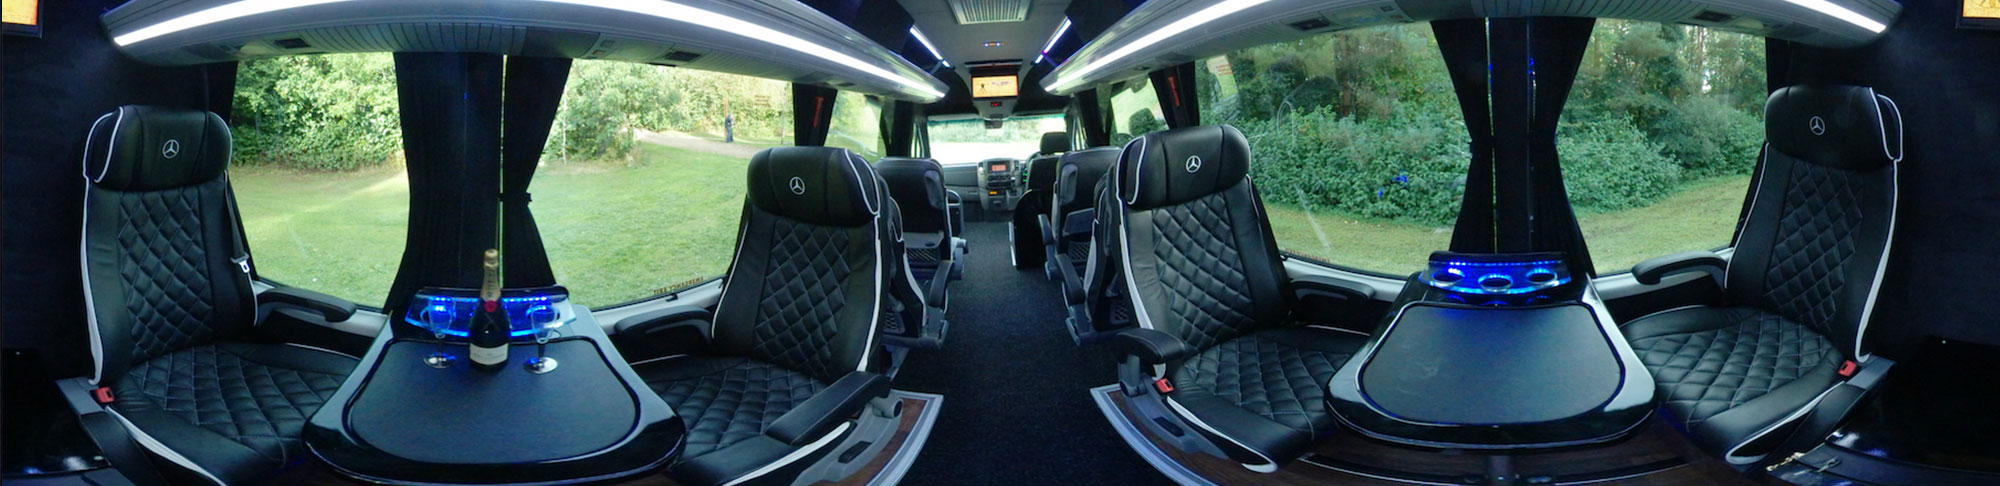 panoramic photograph of interior luxury van conversion